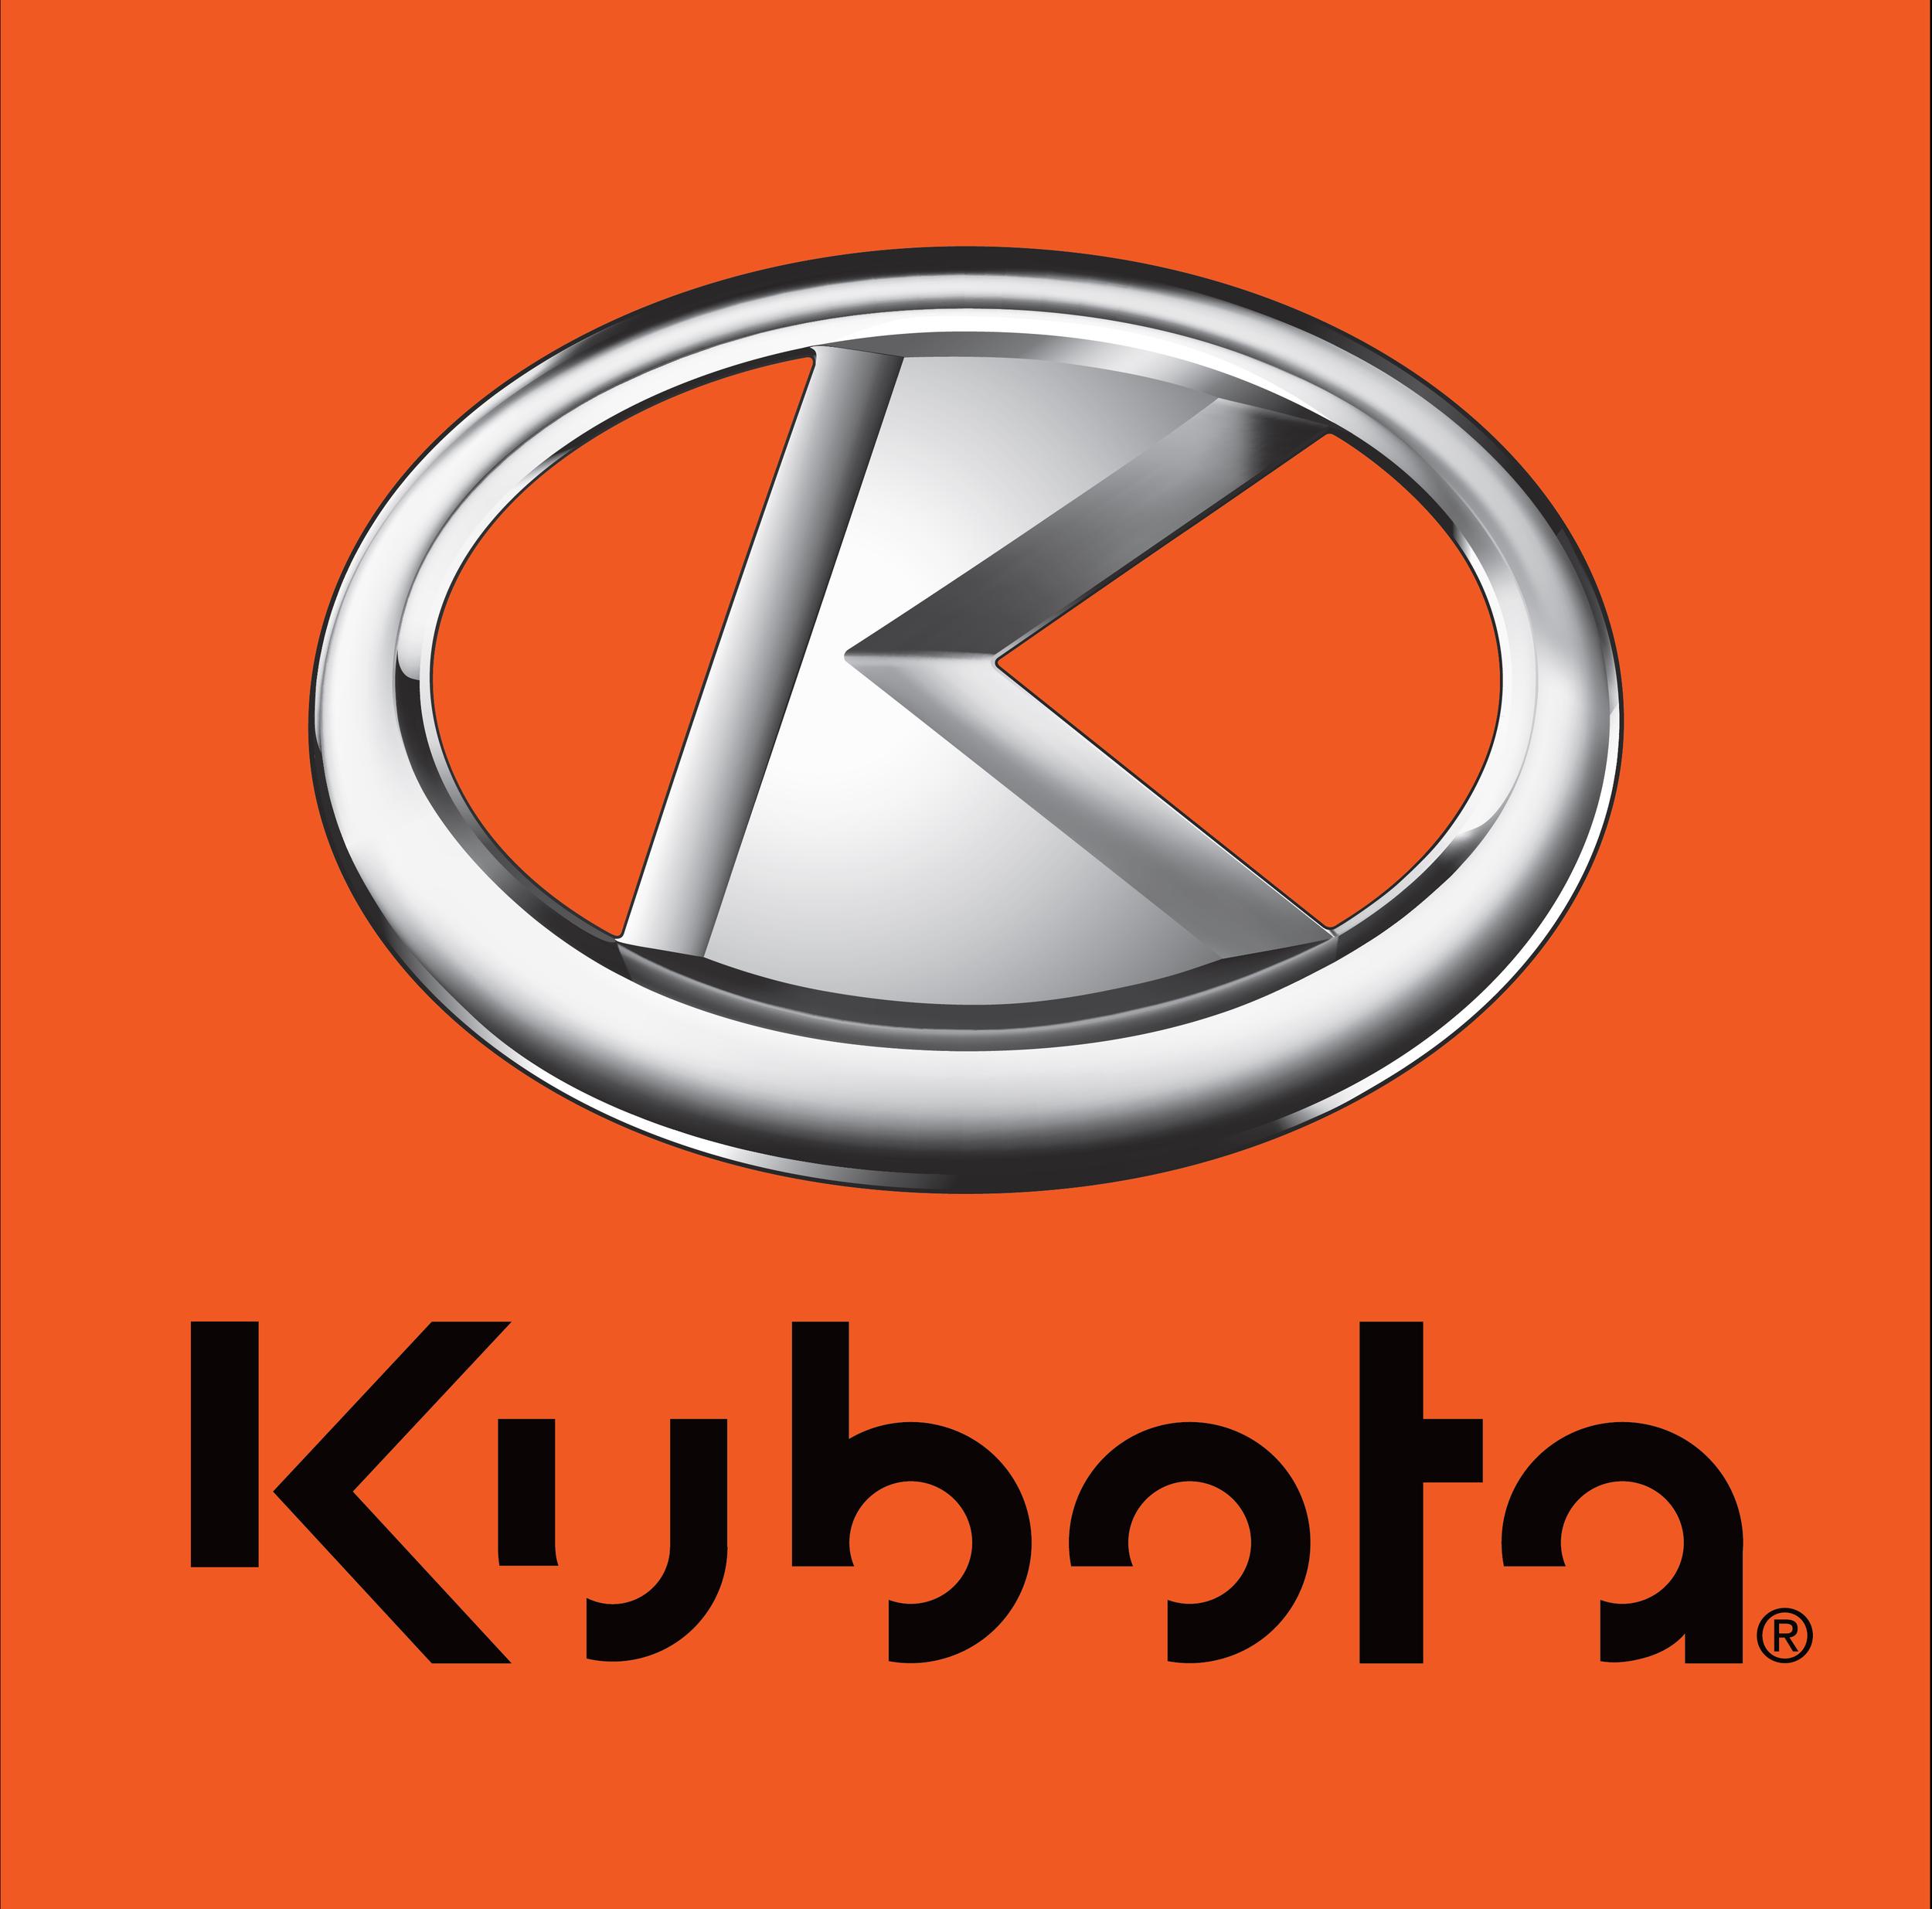 Need Kubota Parts? - Click the Logo